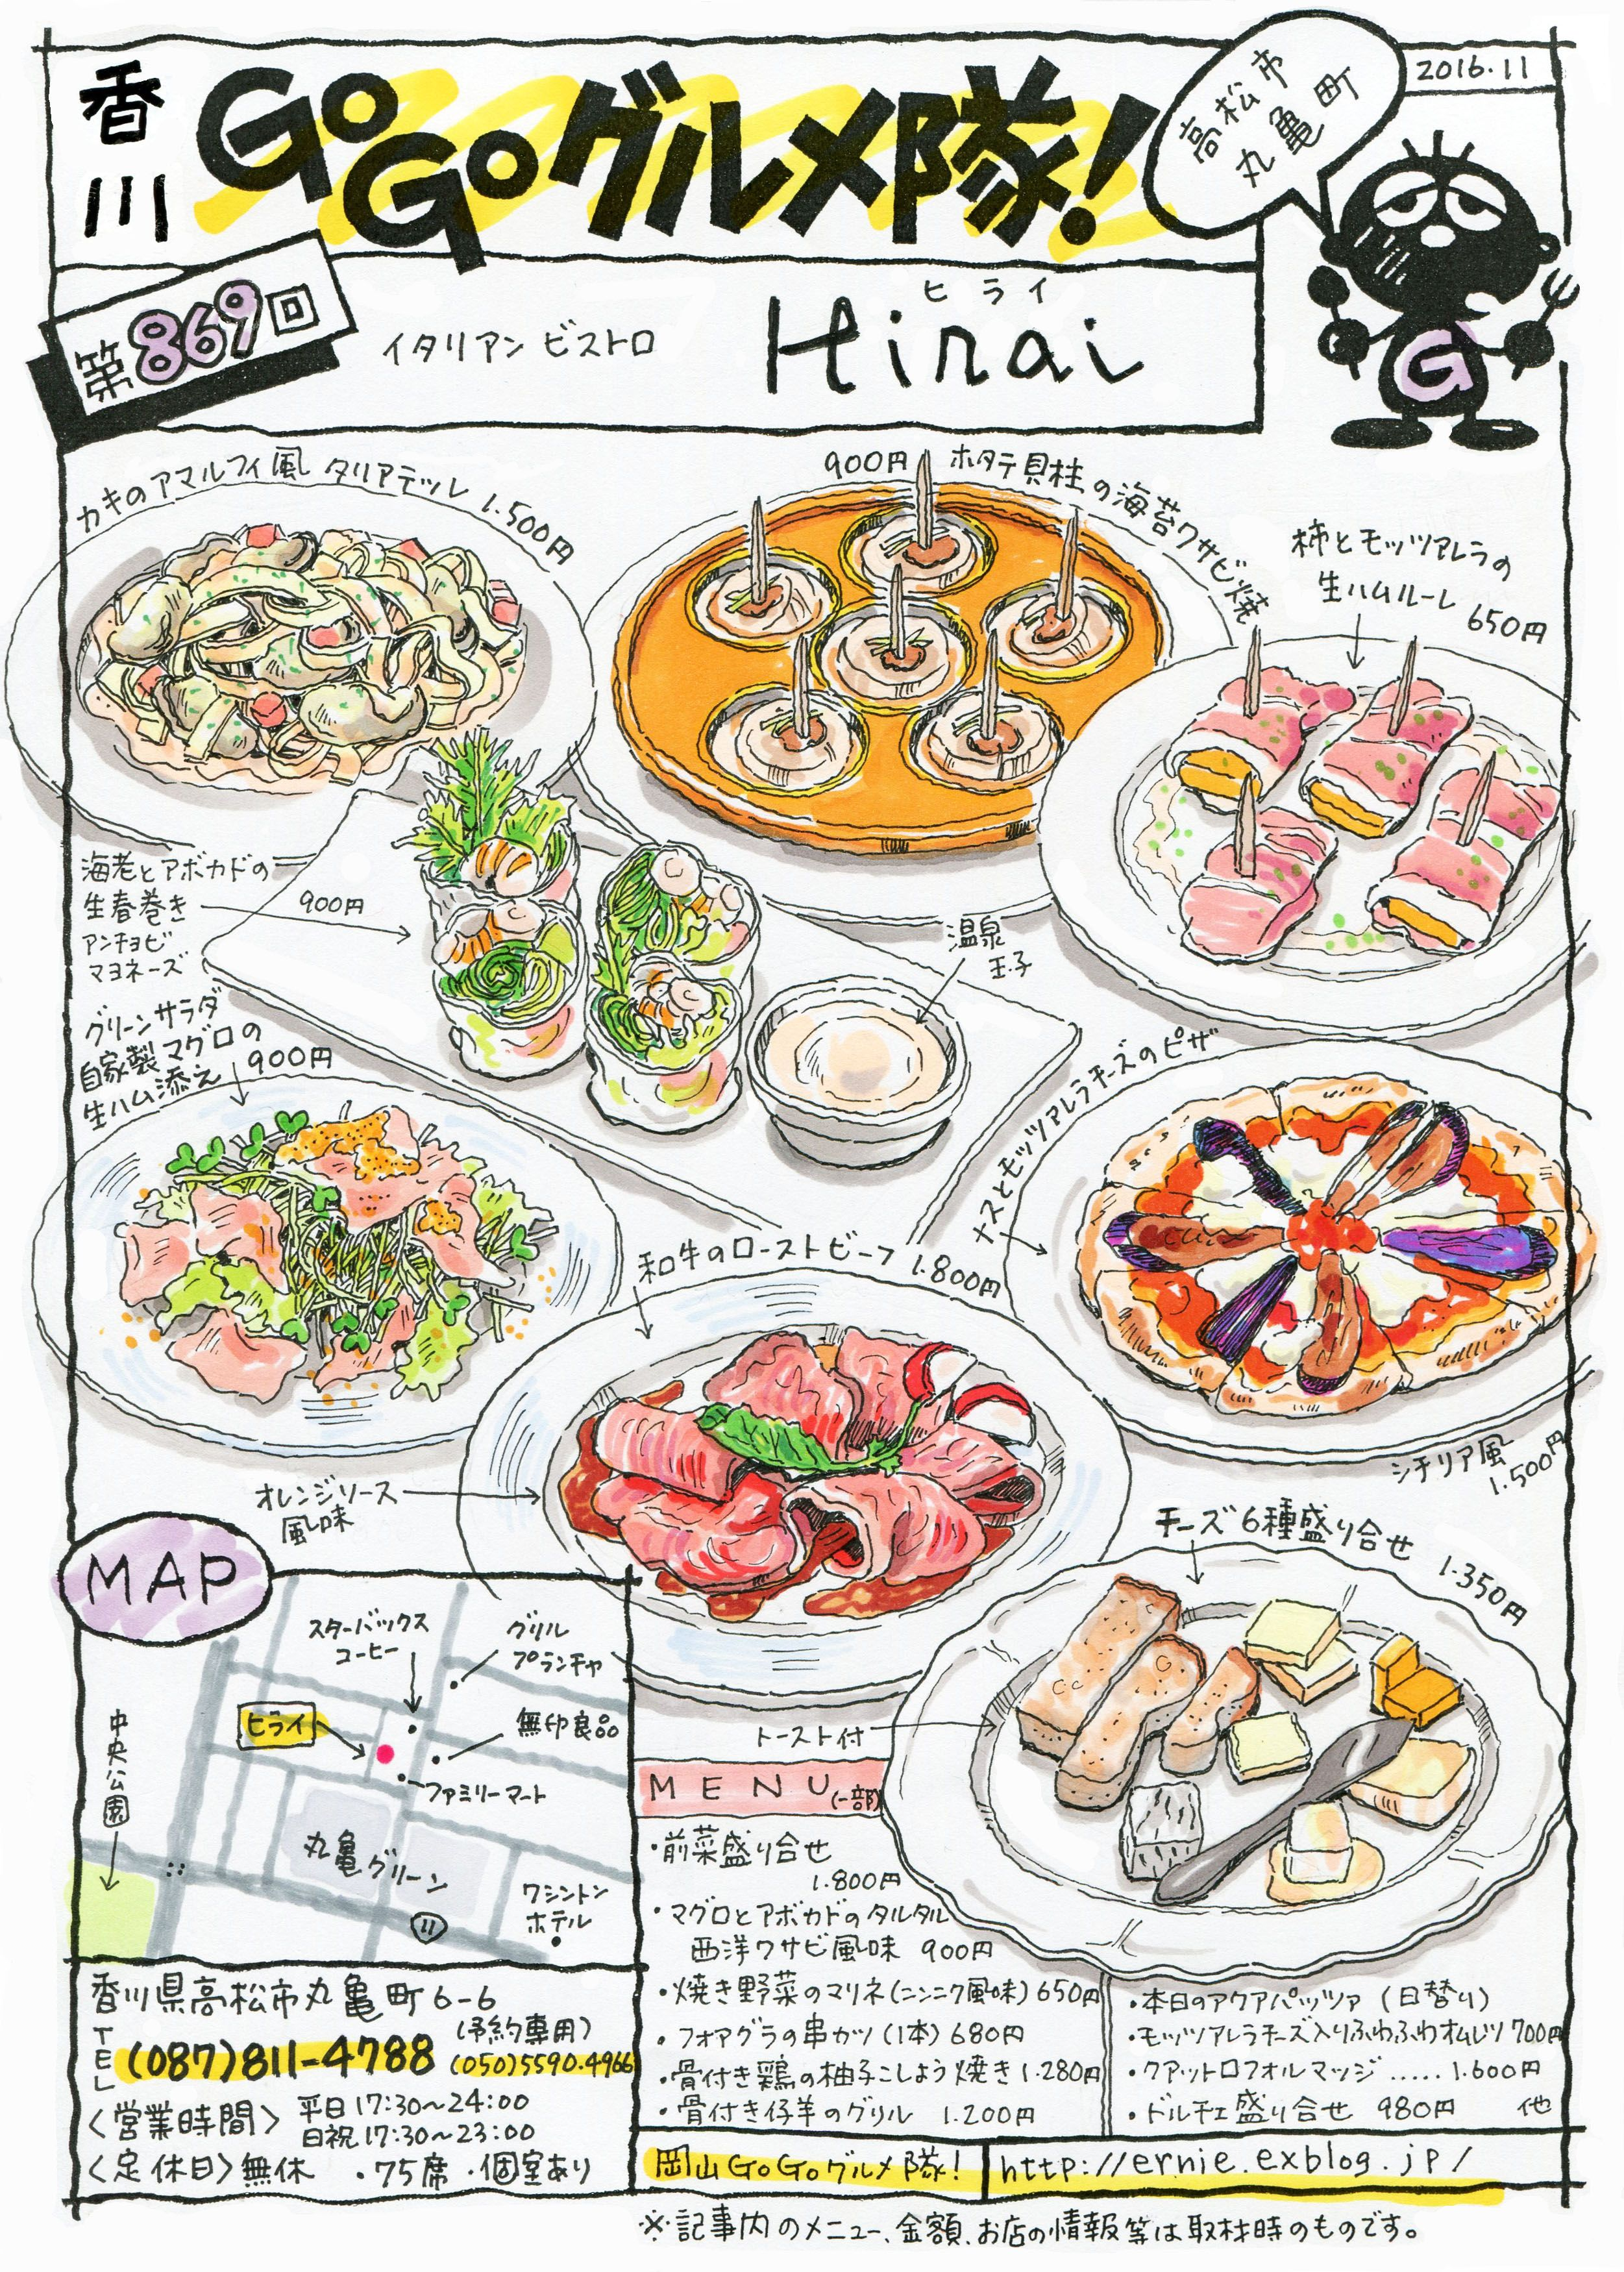 Cucina Italiana イタリアン 岡山県 岡山市 日本 グルメ